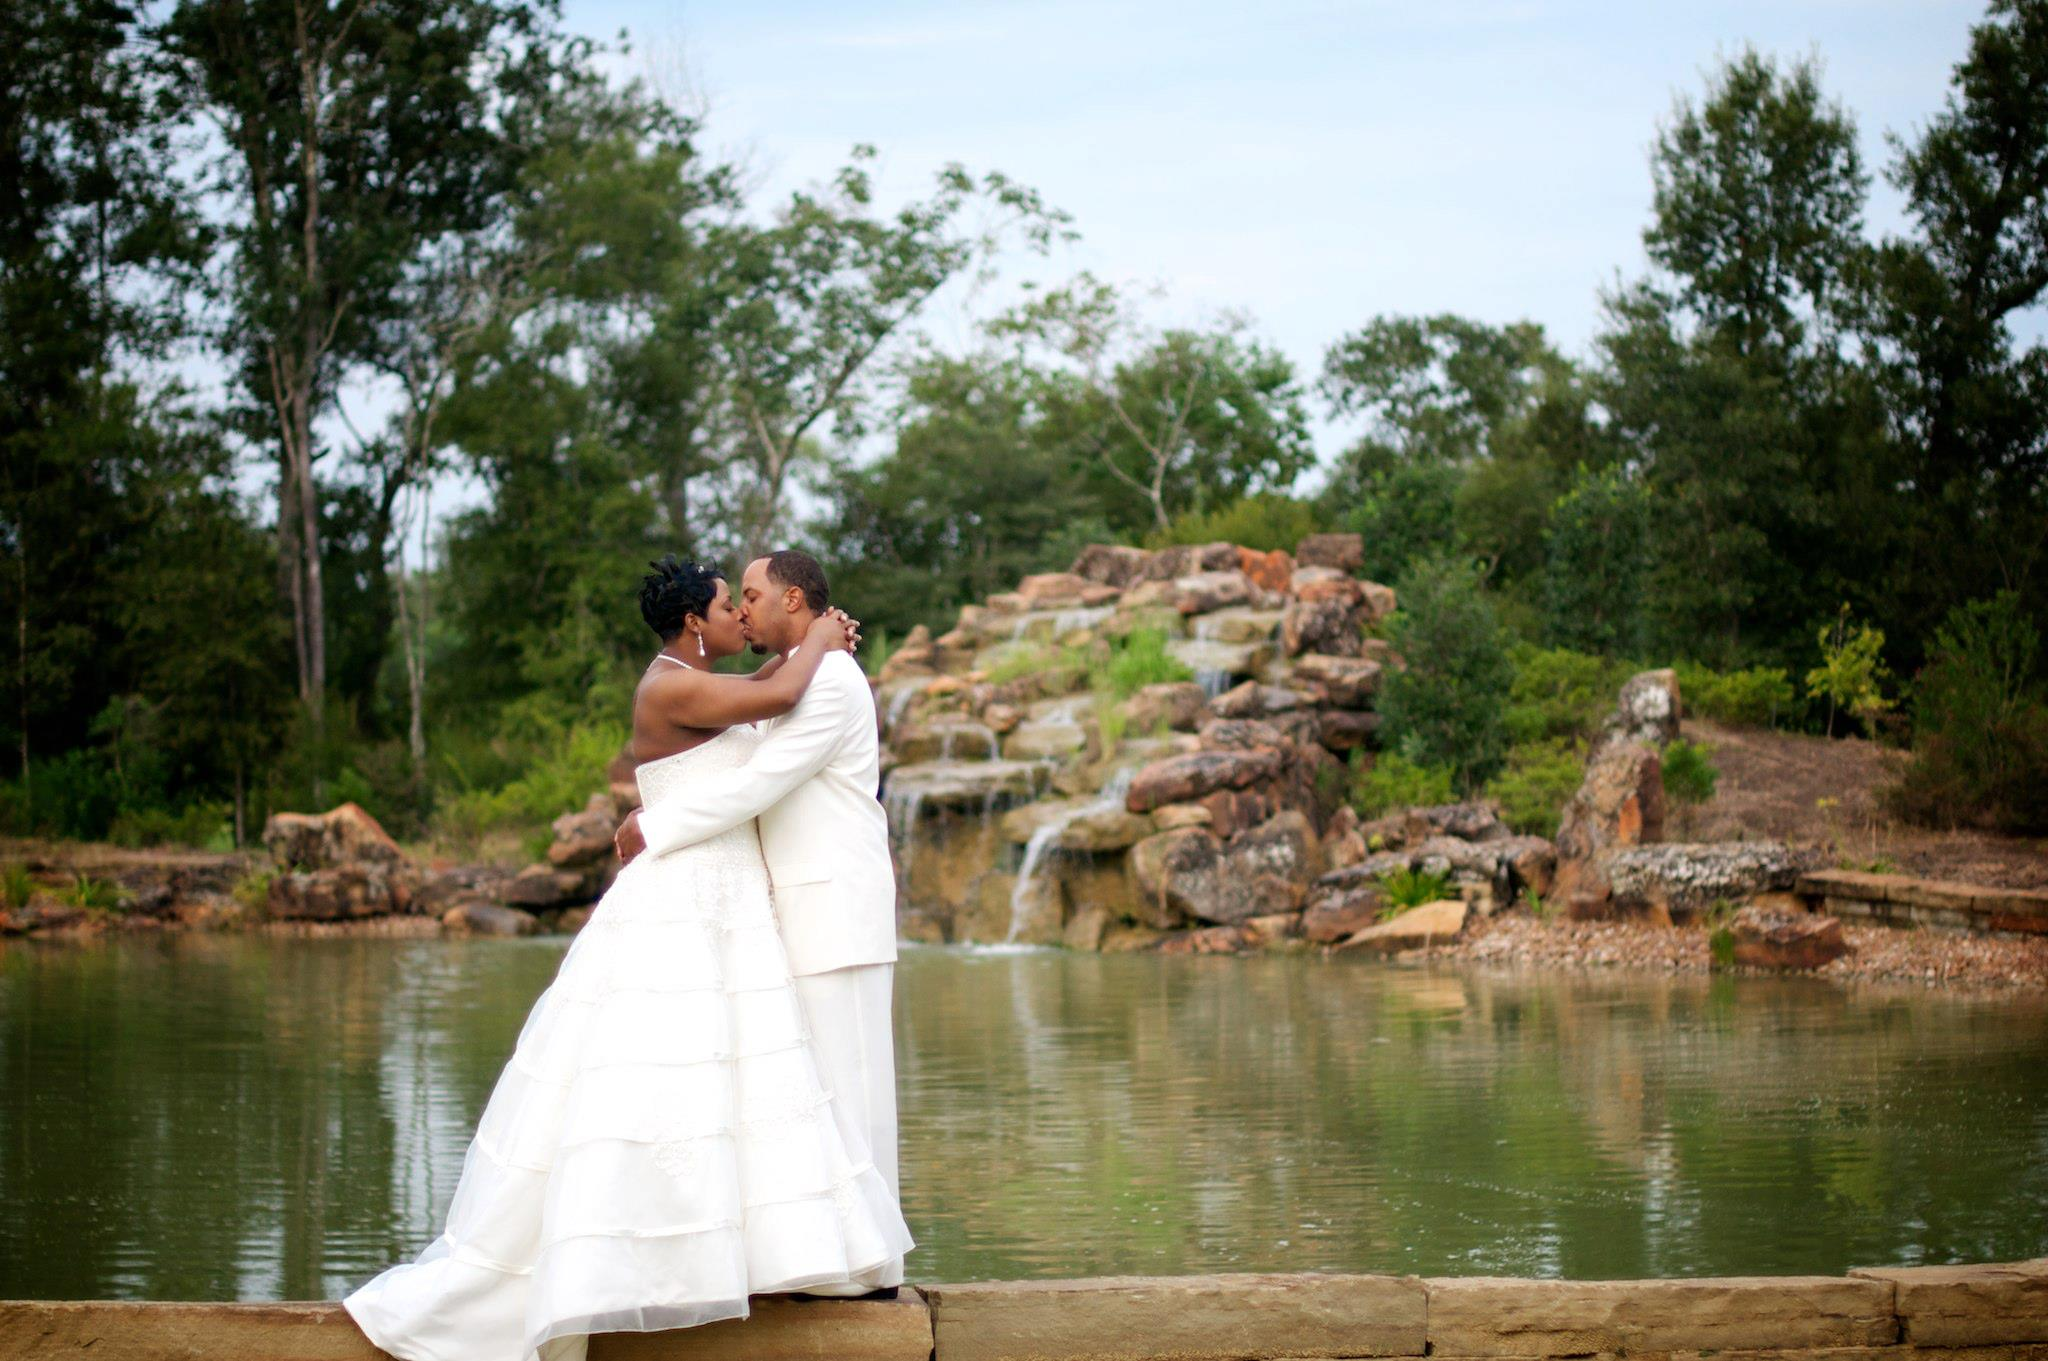 gauthier wedding 3.jpg